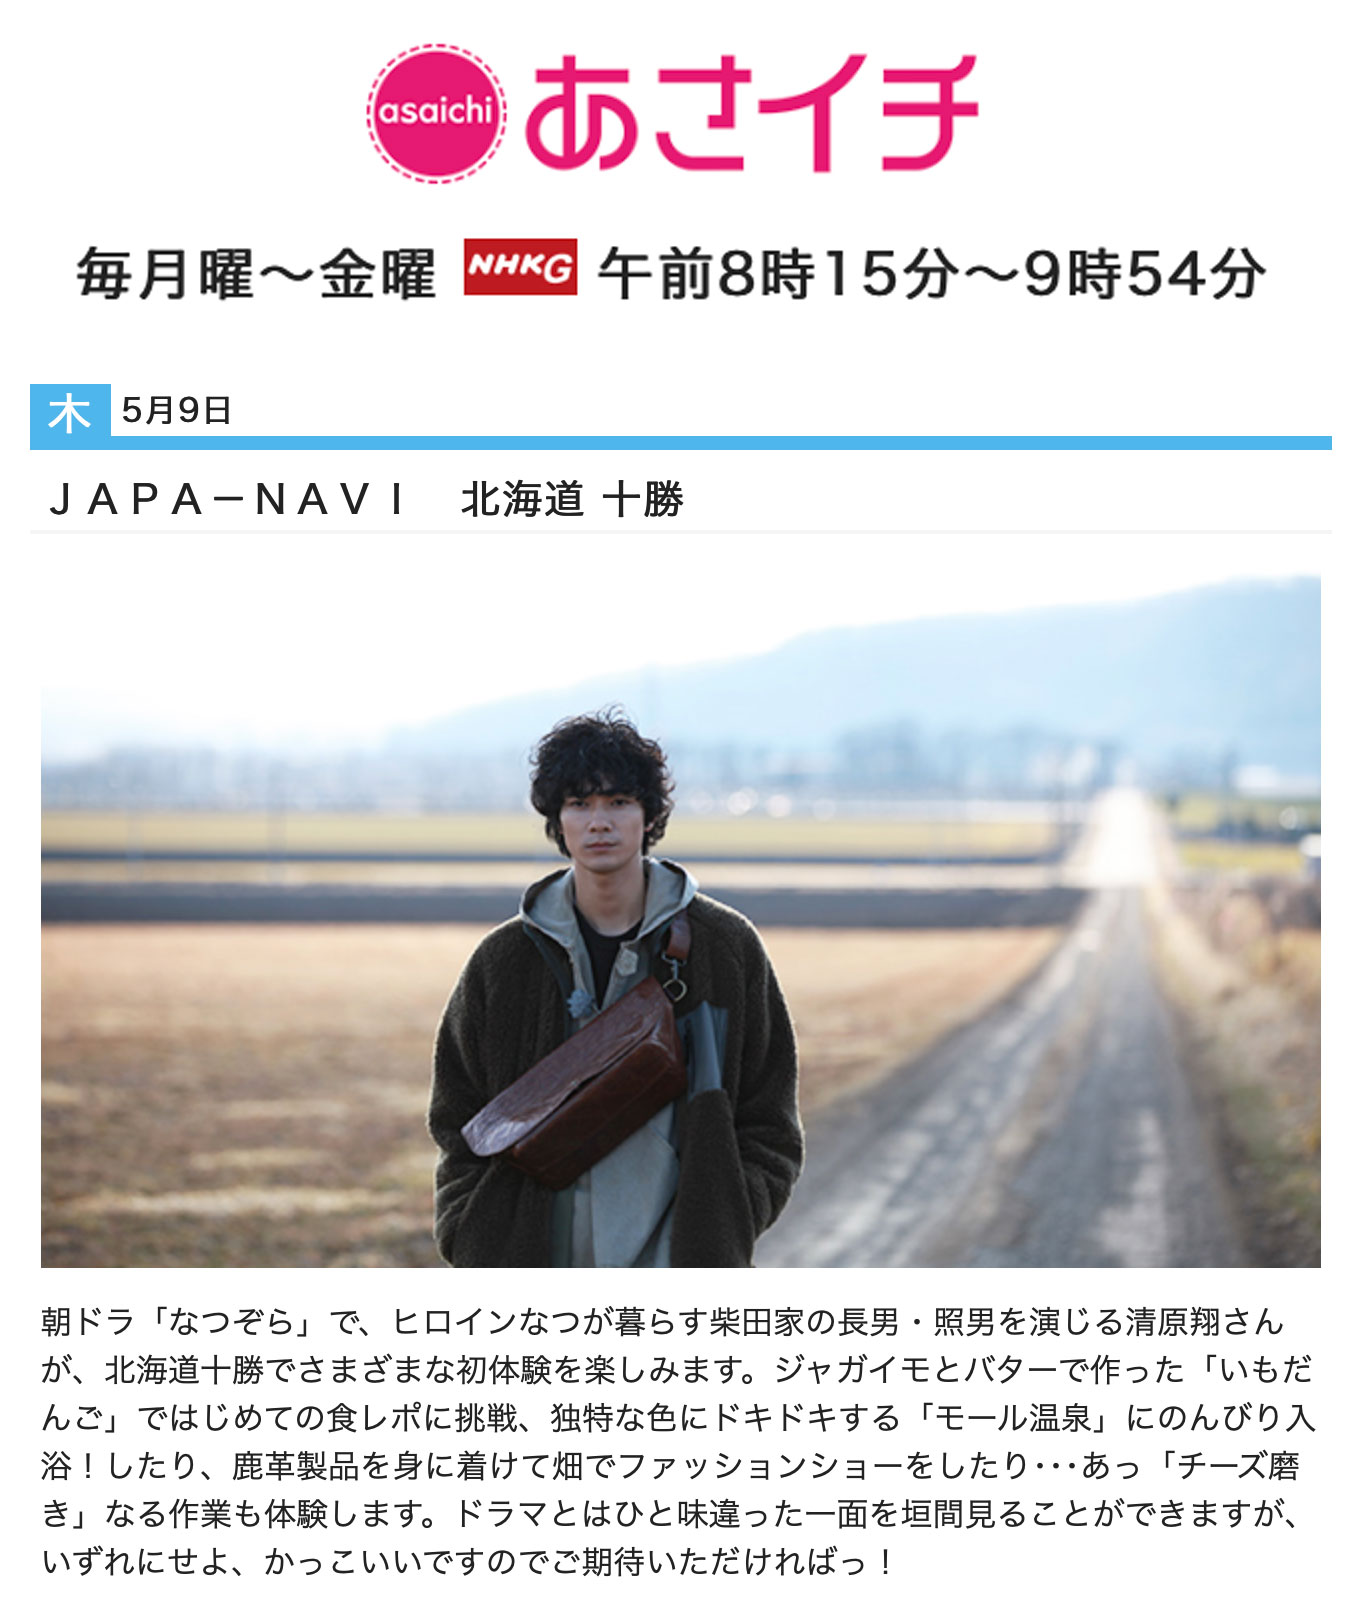 NHK : あさイチで紹介されました。